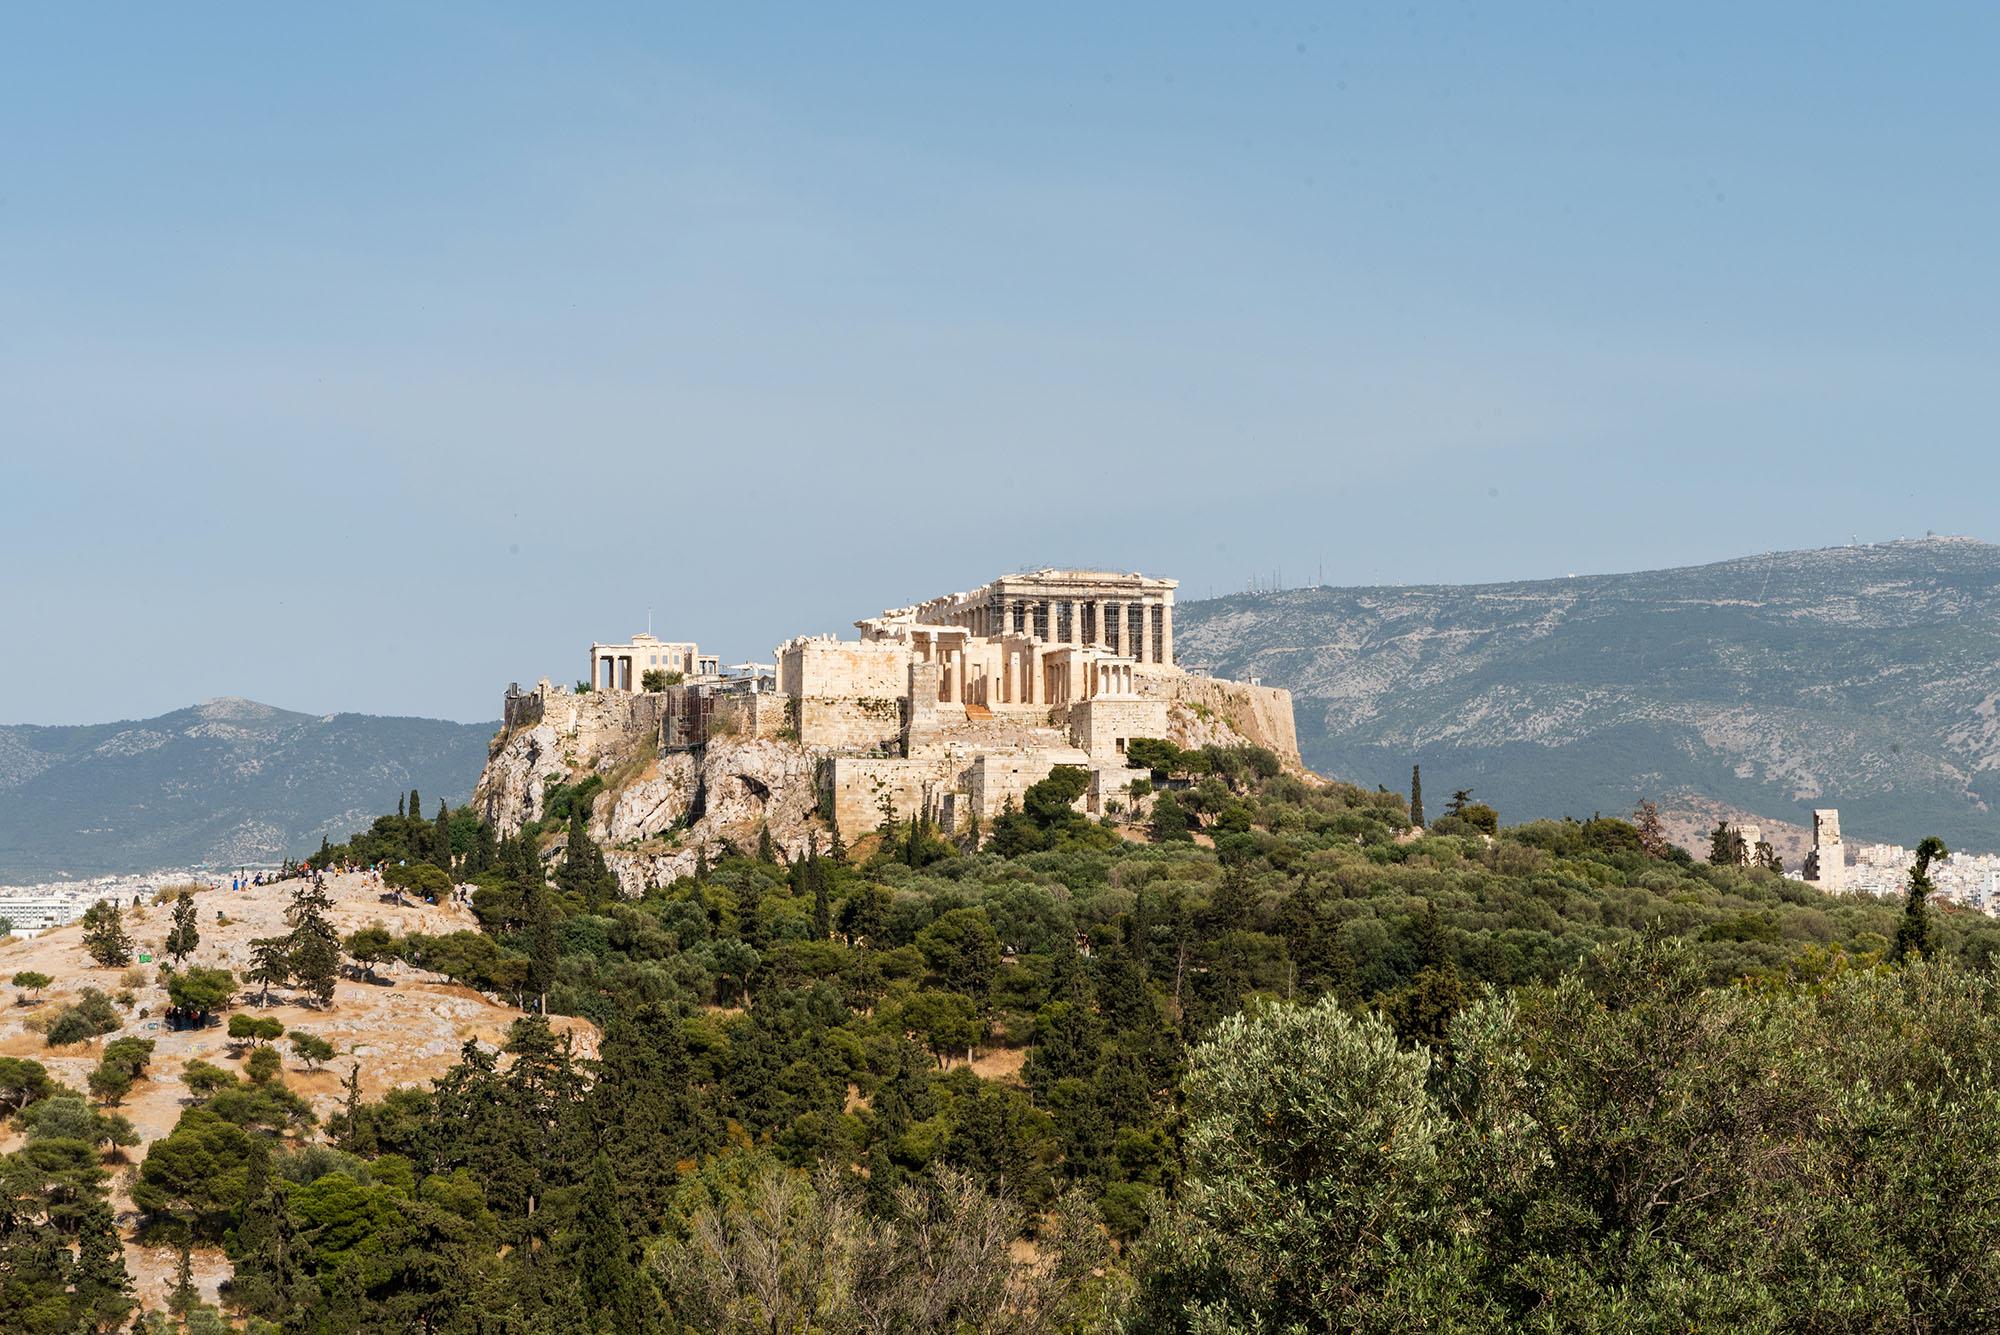 EDIT_view-of-the-acropolis-of-athens-greece-Z2PT9UQ.jpg